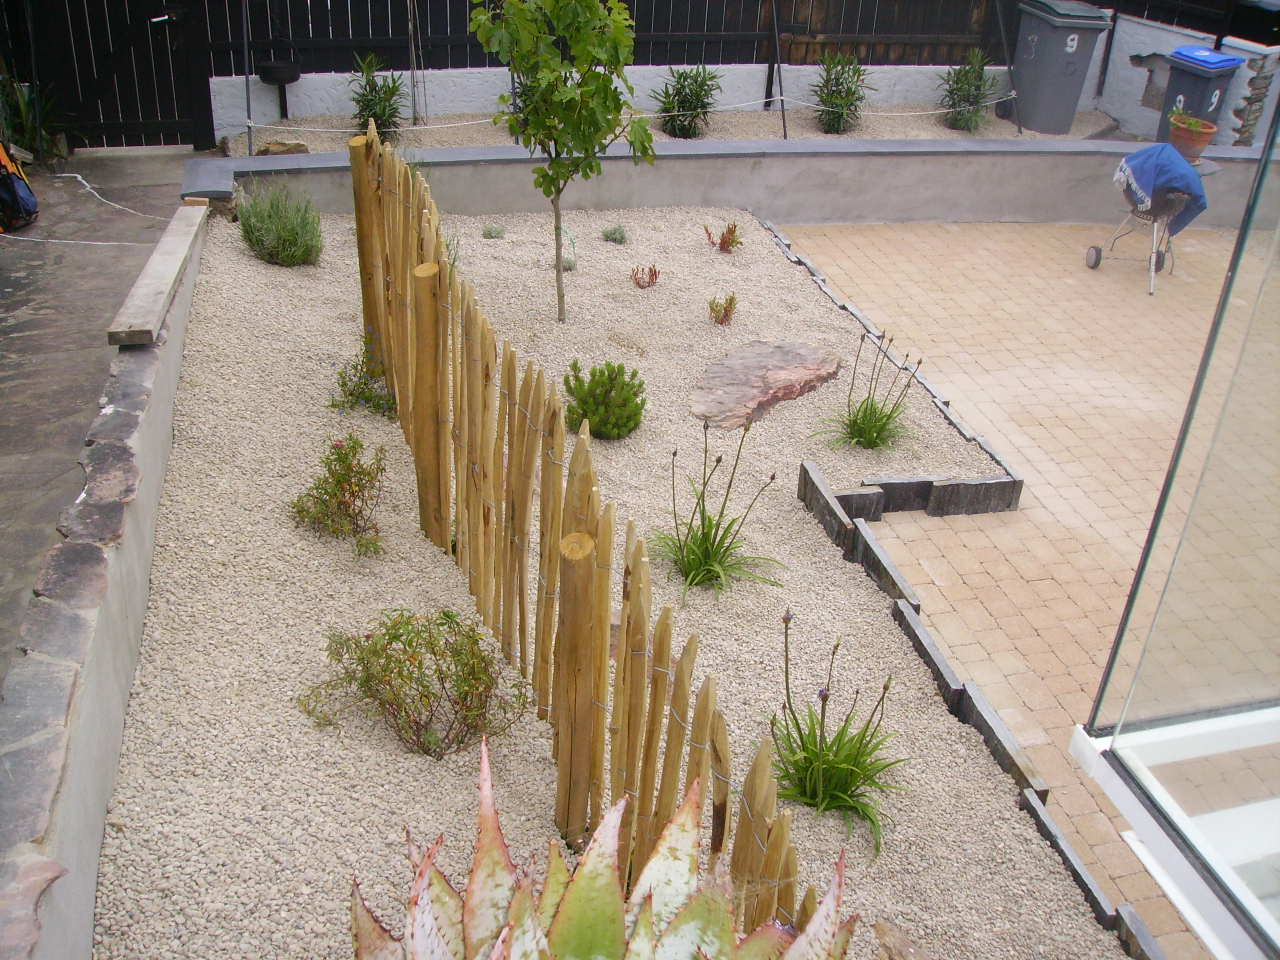 Amenagement talus amenagement talus plantations talus for Amenagement jardin sol